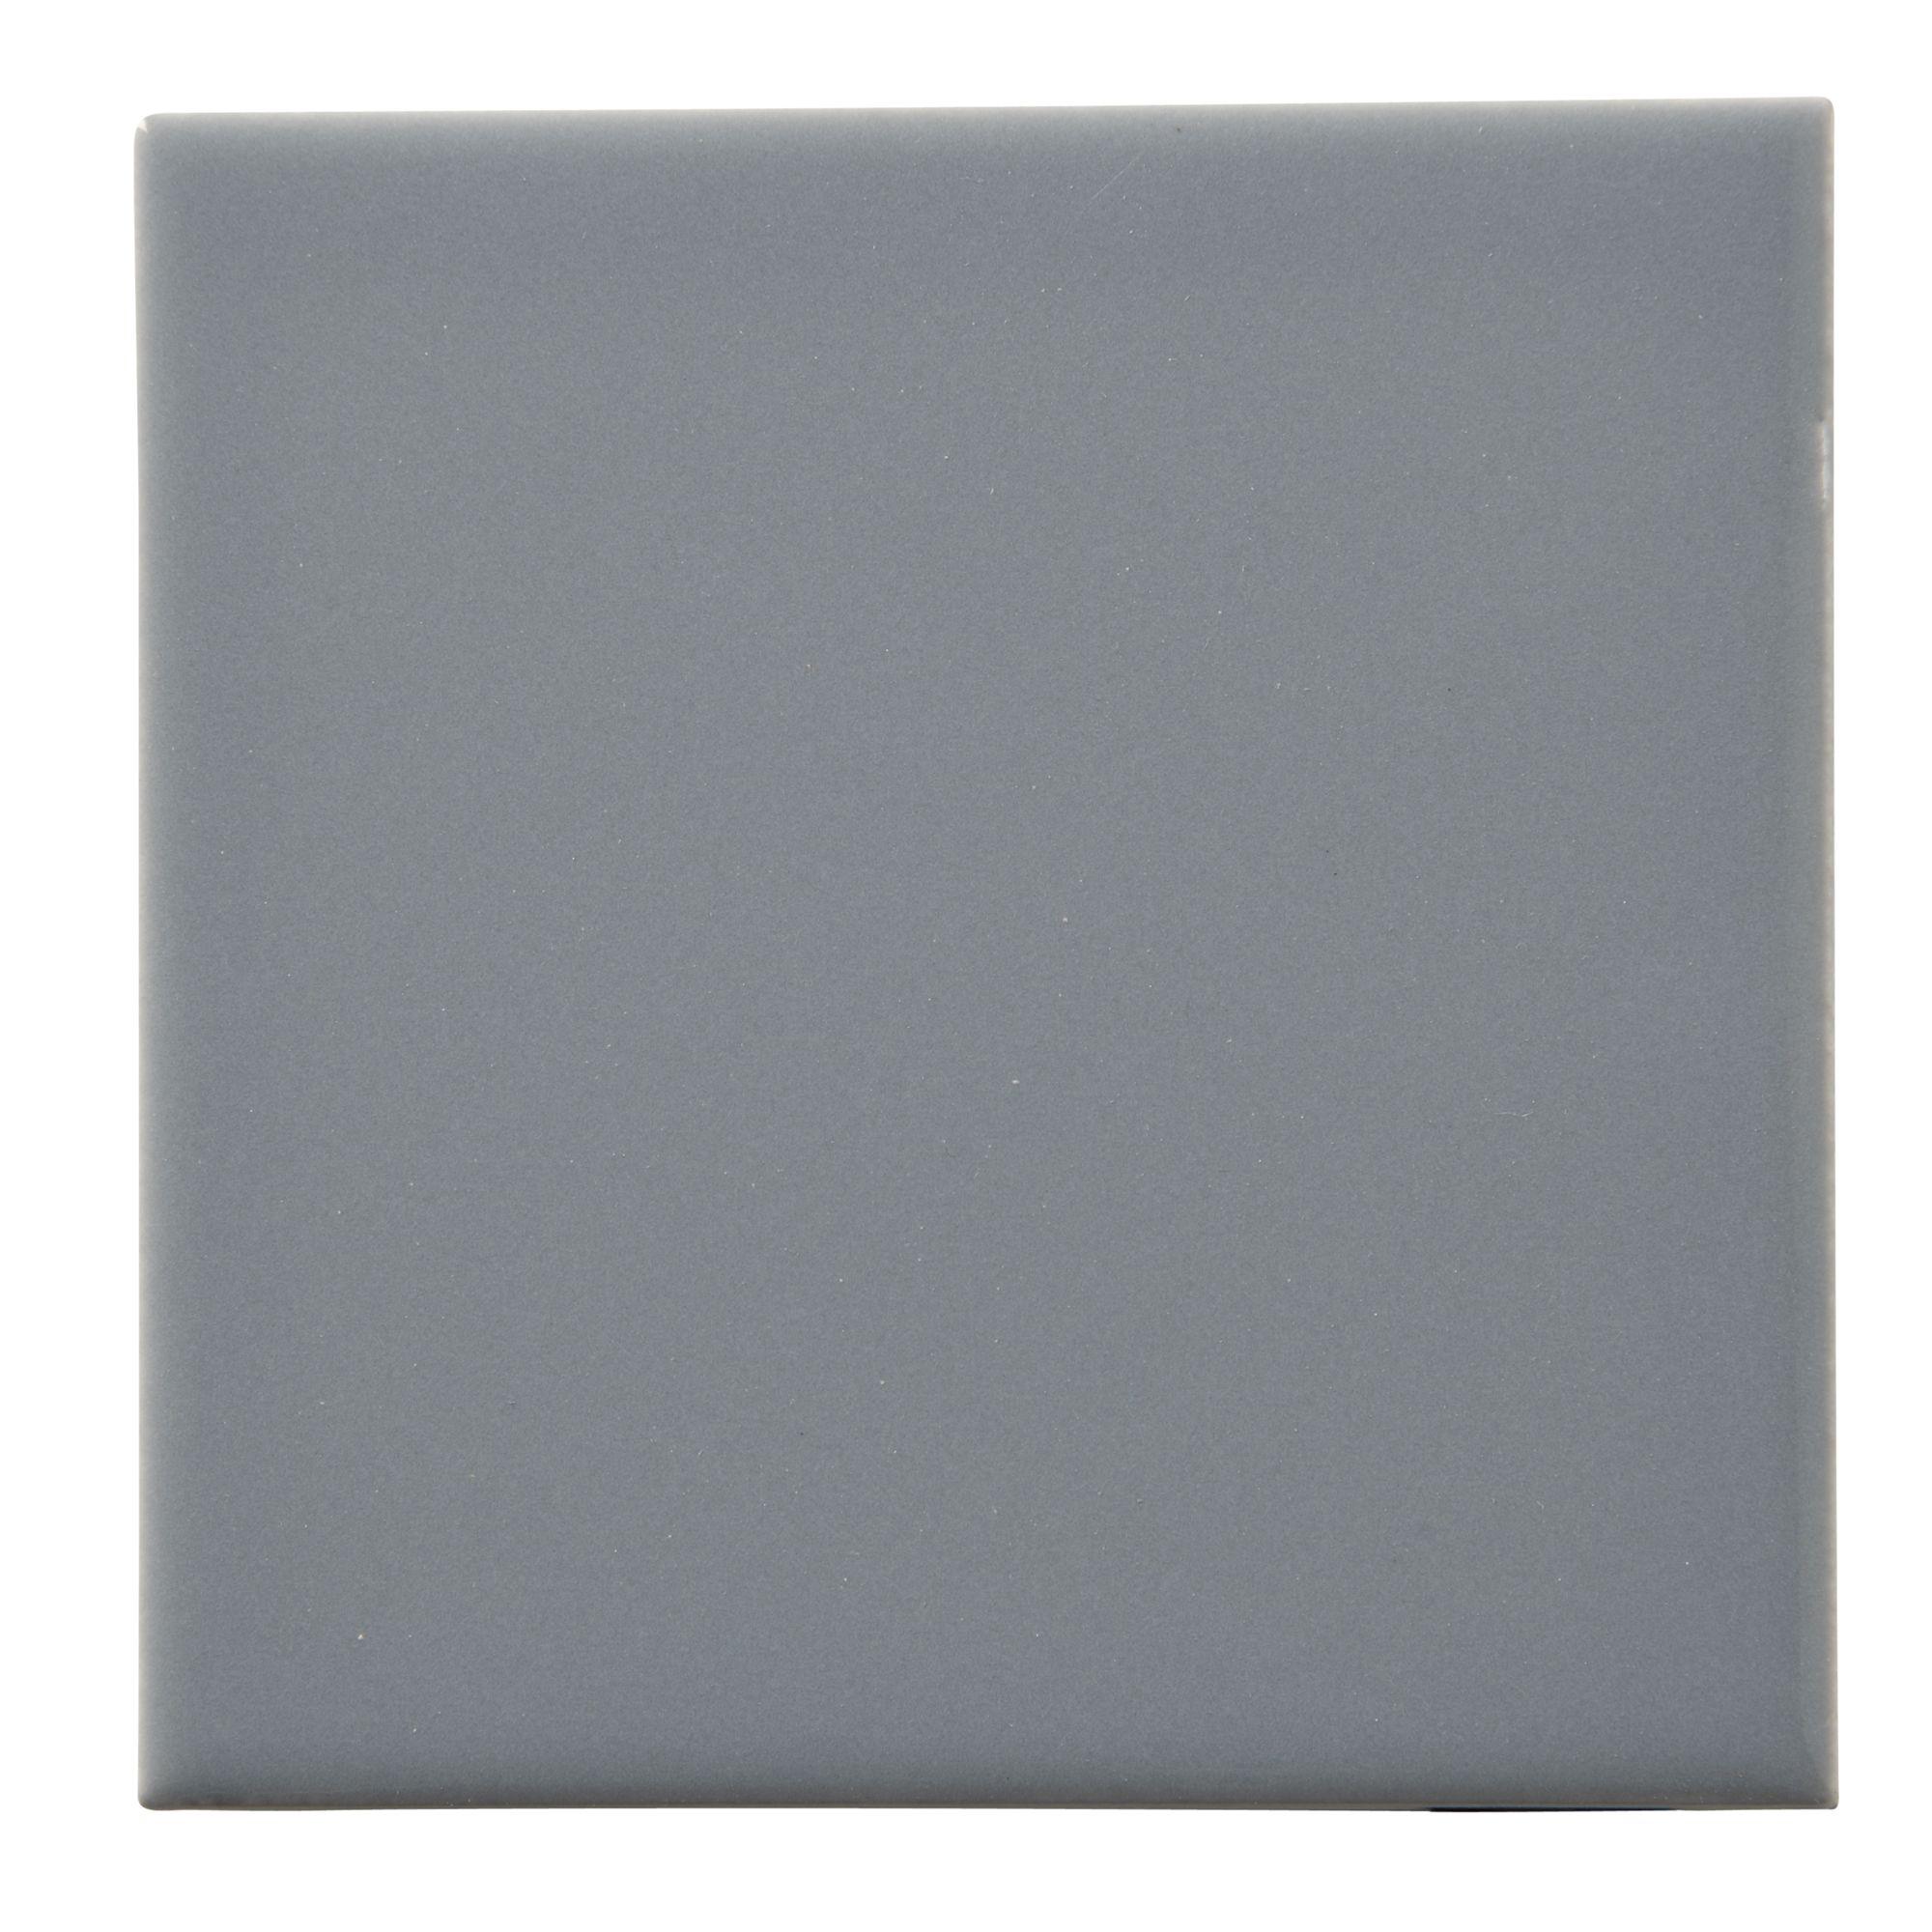 Colours Grey Ceramic Wall Tile DIY